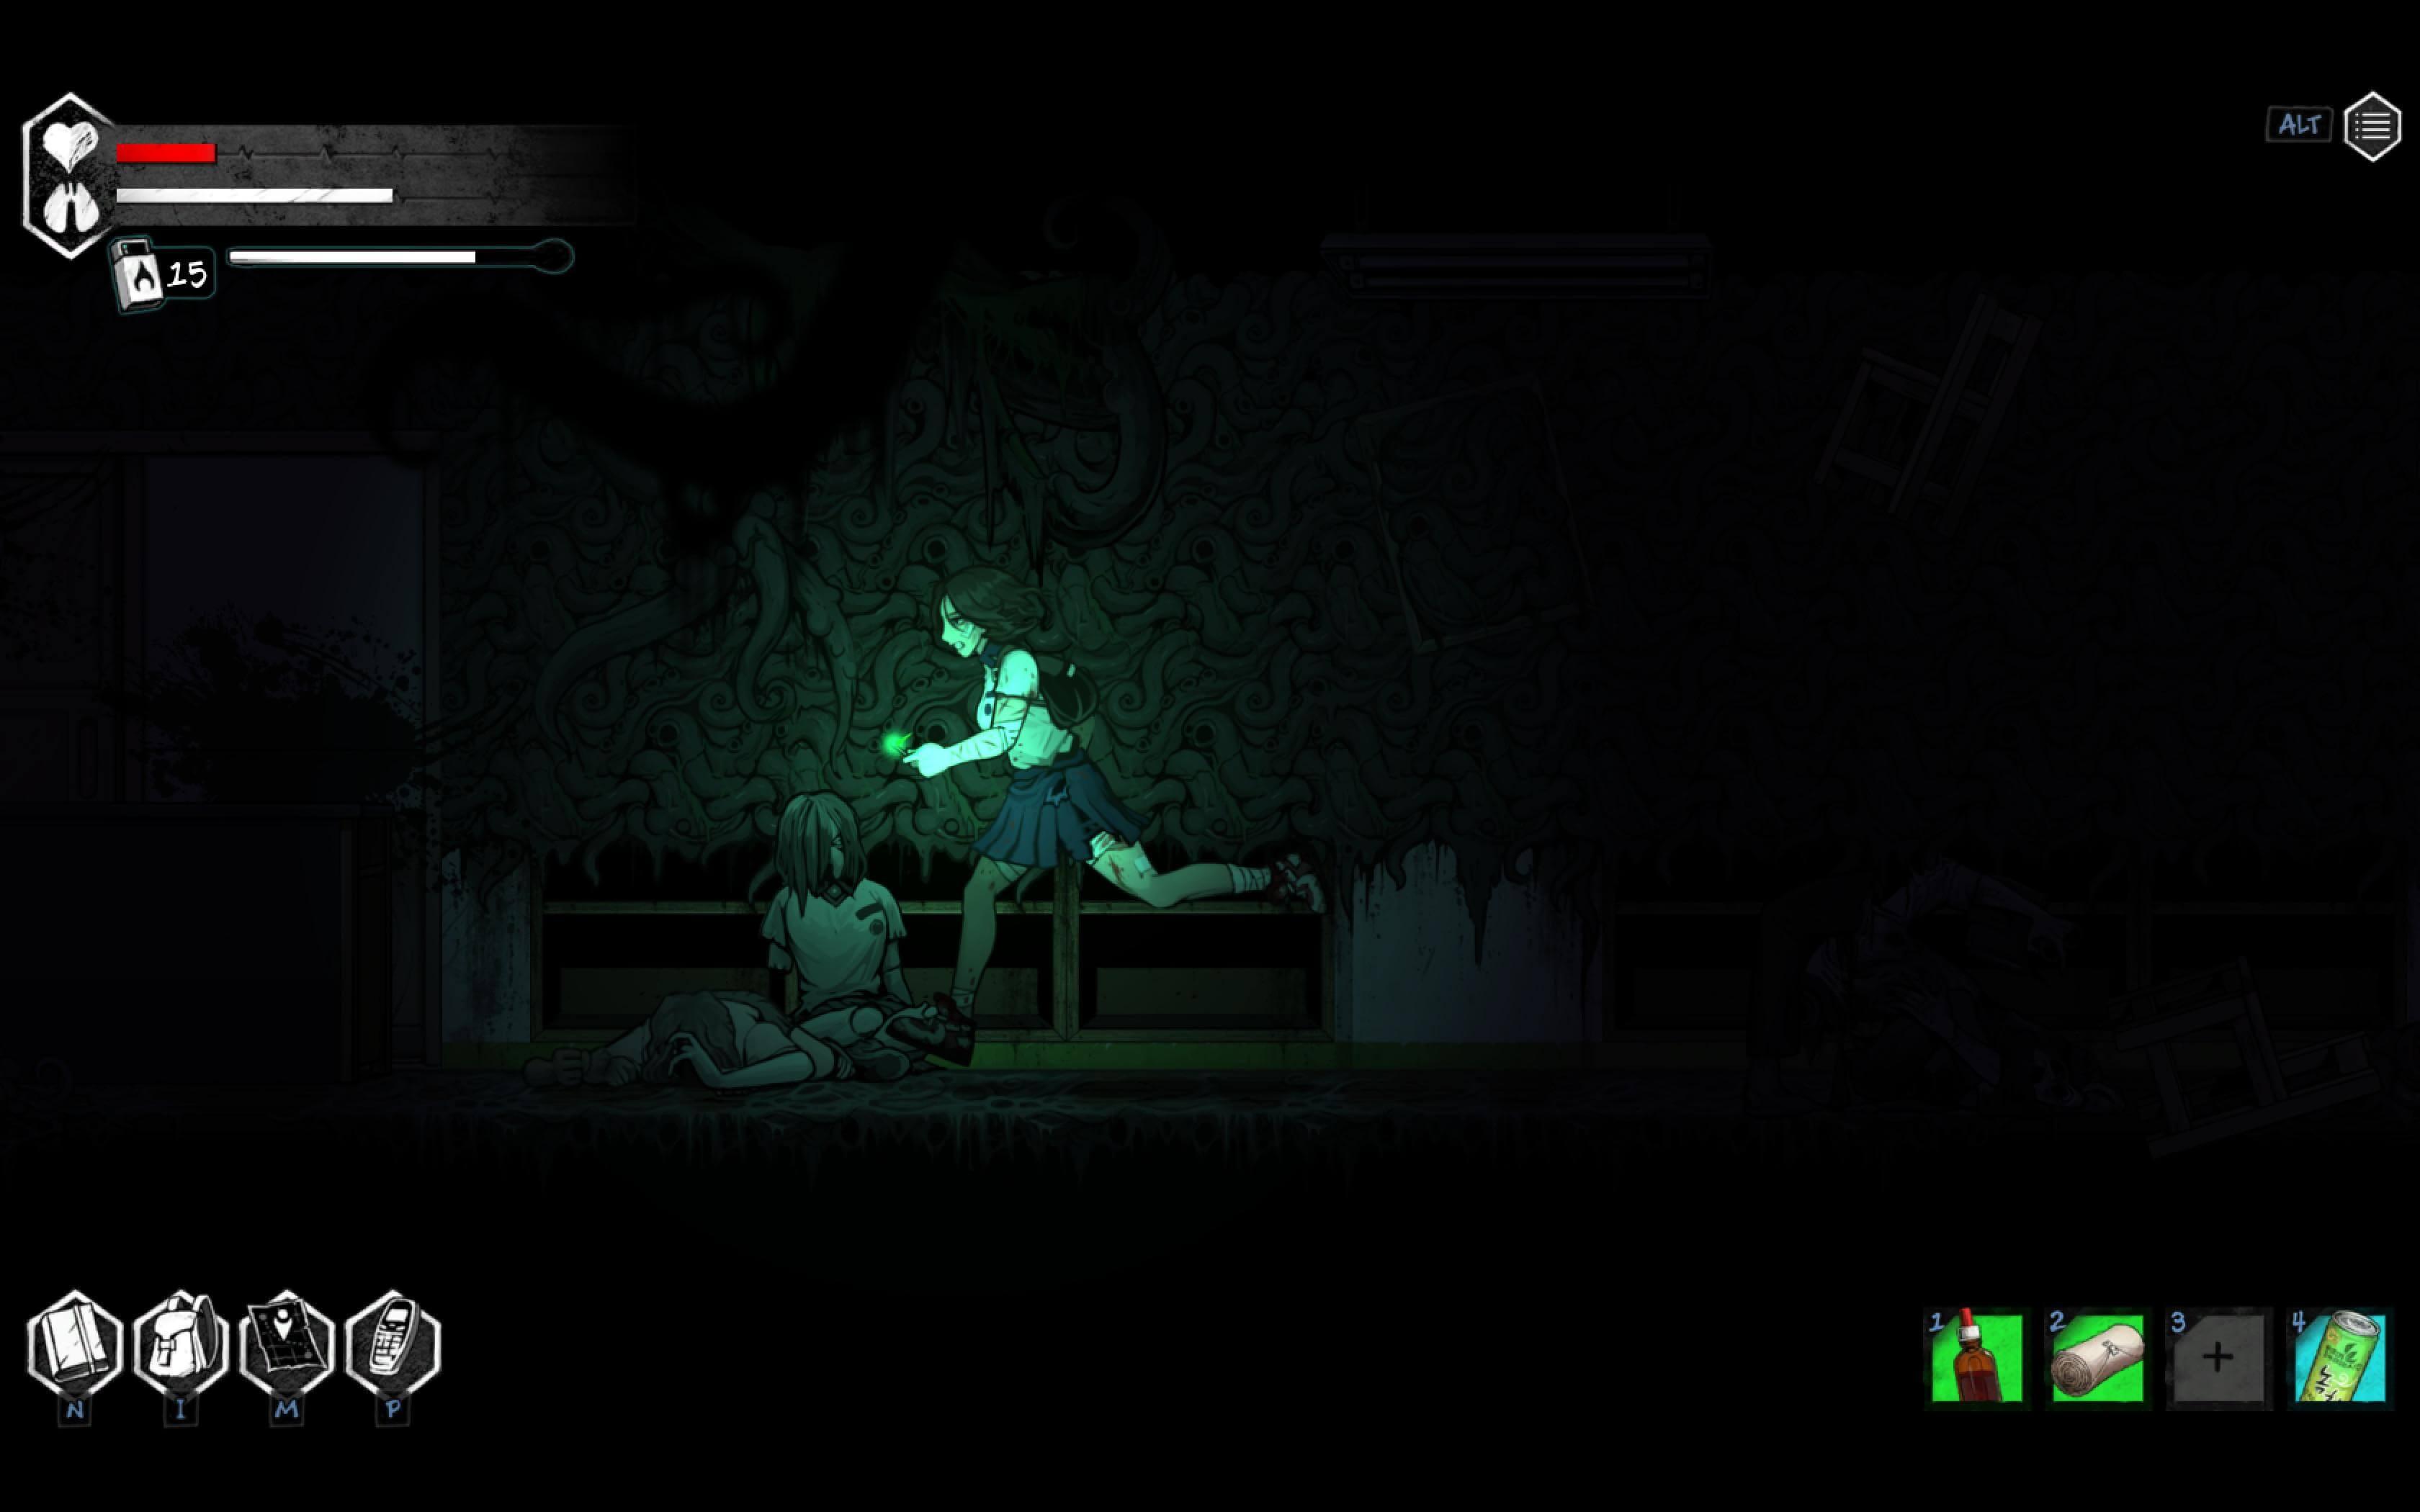 Скриншот из игры The Coma 2: Vicious Sisters